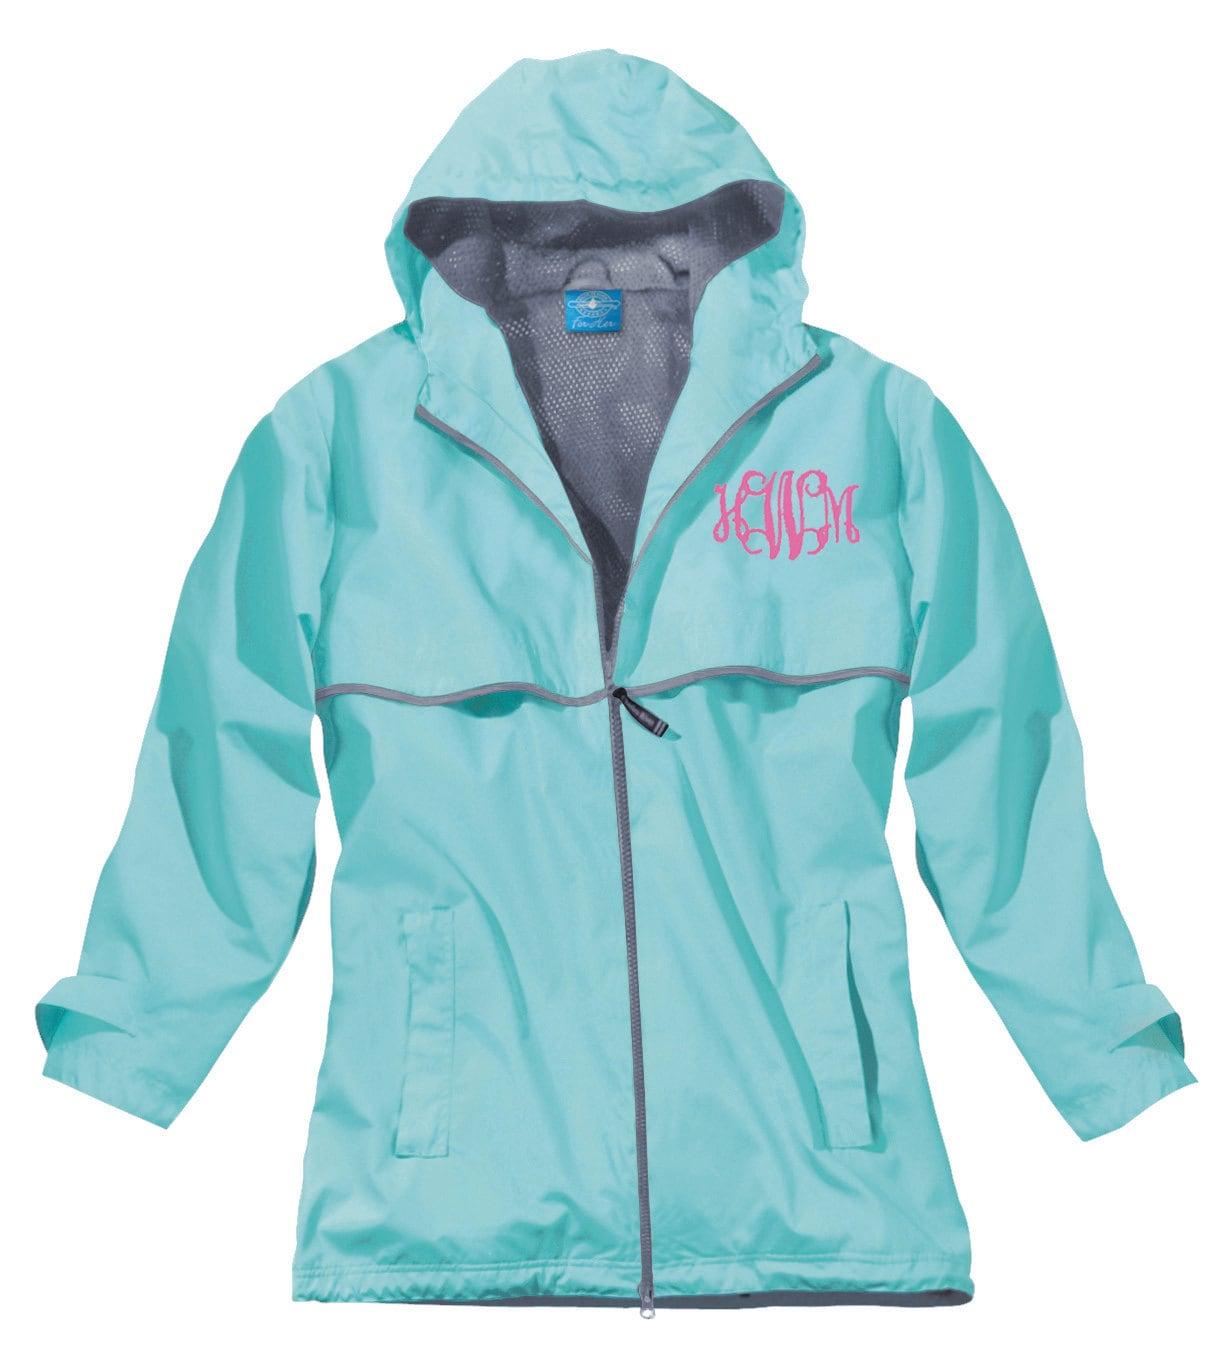 Monogram Rain Jacket - Womens Rain Jacket - Hooded Jacket - Lightweight Jacket - Rain Jacket - Monogrammed Jacket - Personalized Jacket KR8wUZzo06